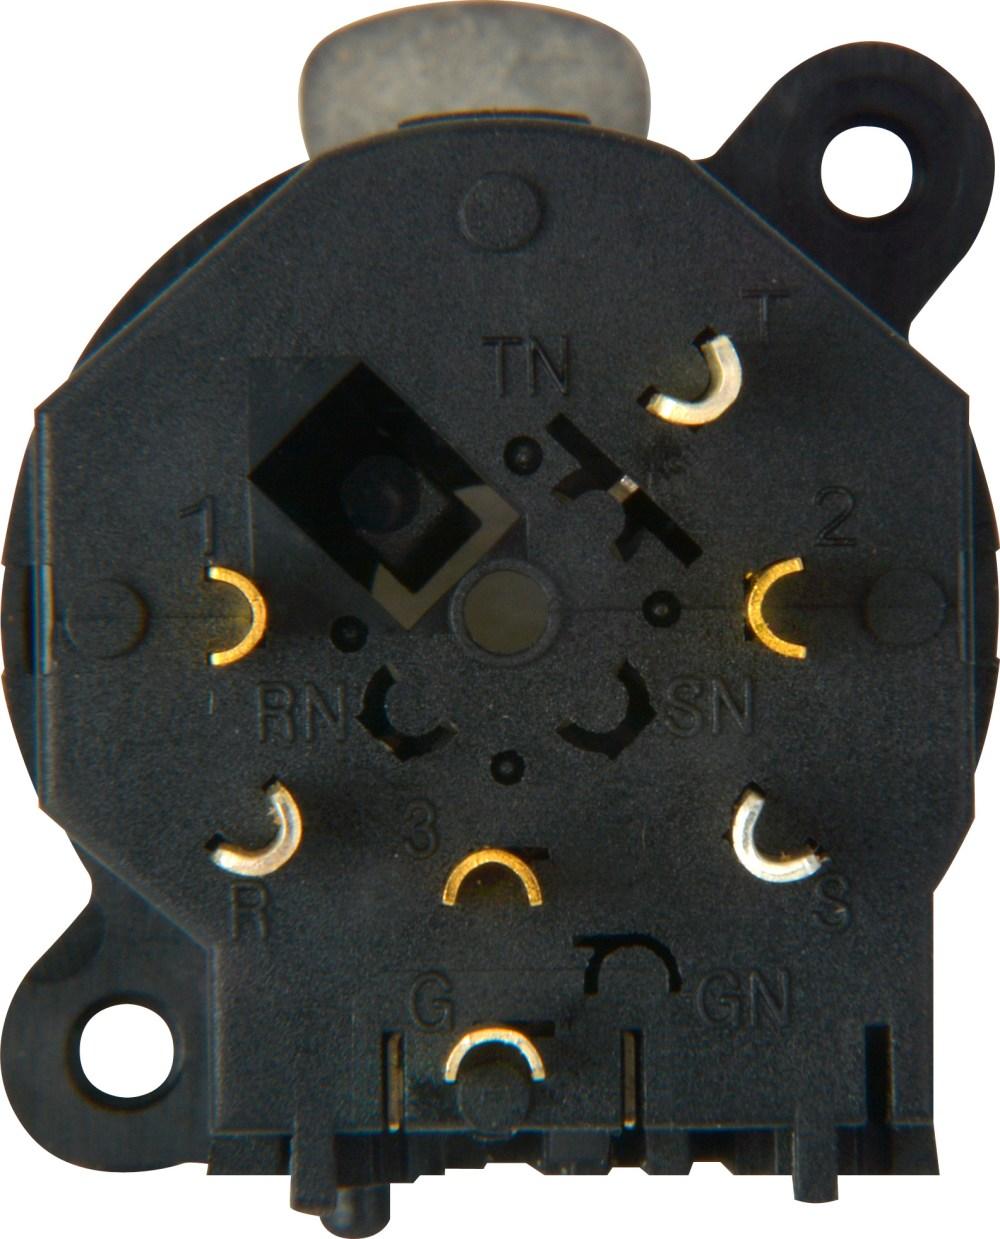 medium resolution of ncj6fi s ncj6fi s rear view ncj6fi s wiring diagram